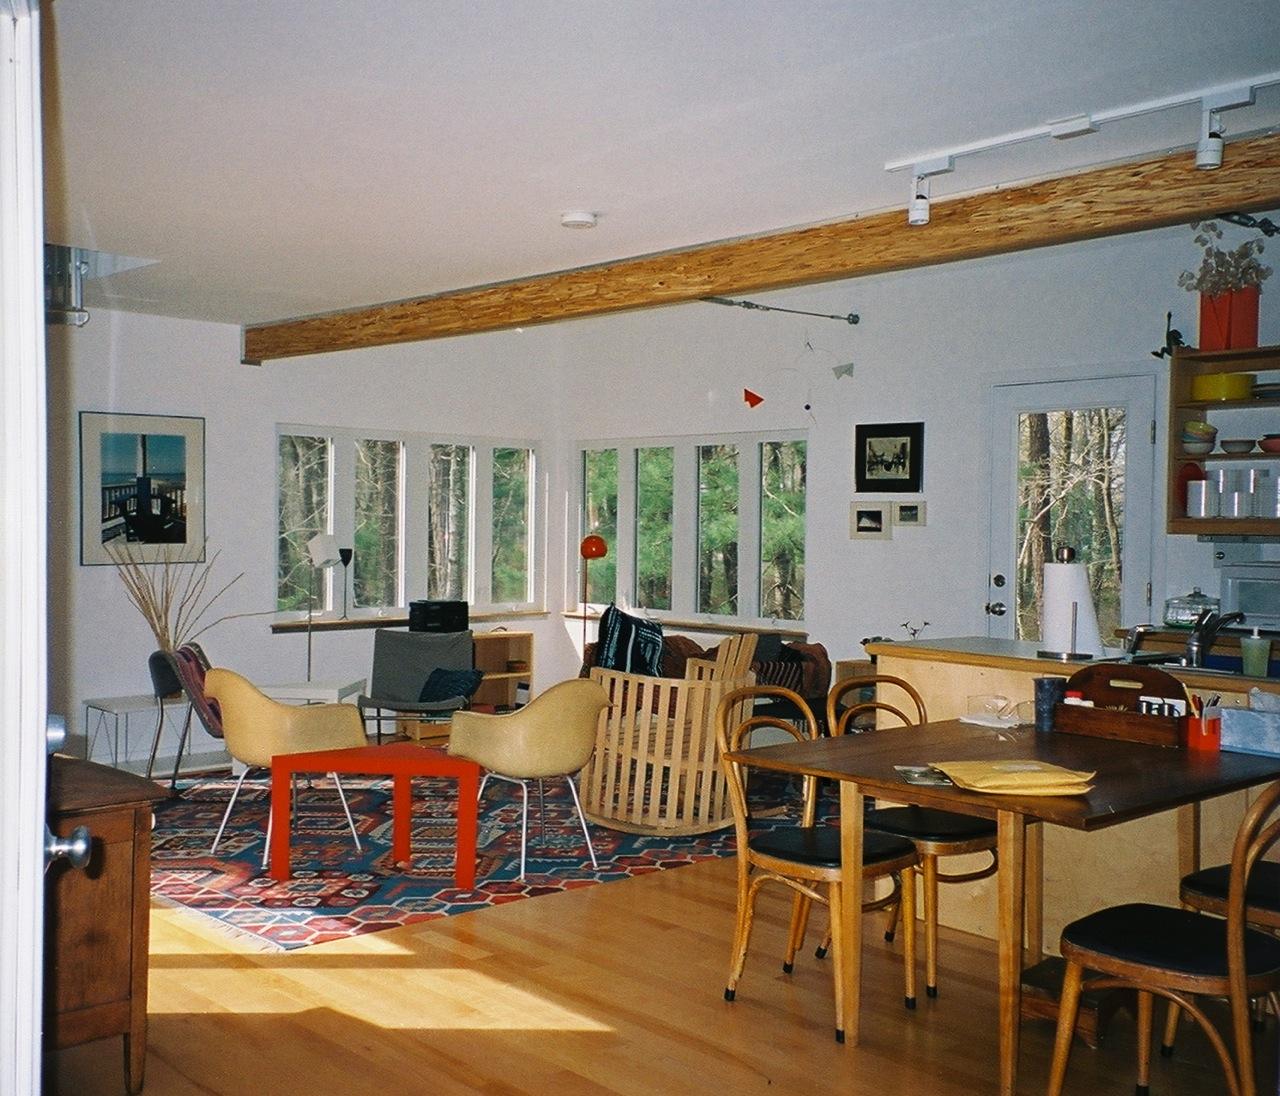 Cape Cod Architect Builder: Portanimicut- A Modern, Minimalist Cape Cod House